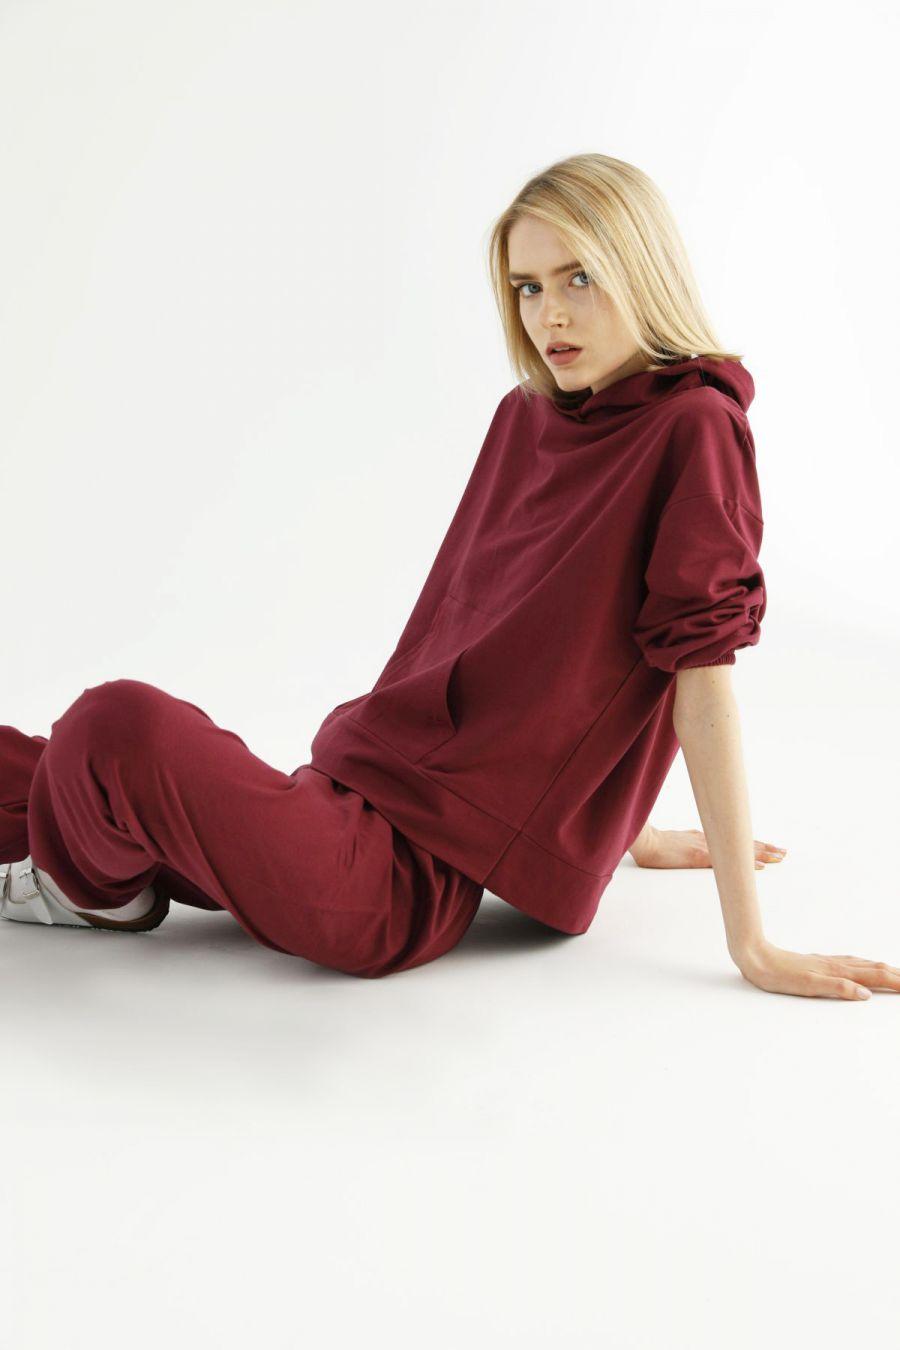 Bordo Kangru Cepli Kapişonlu Eşofman-Sweatshirt Takım 21278024